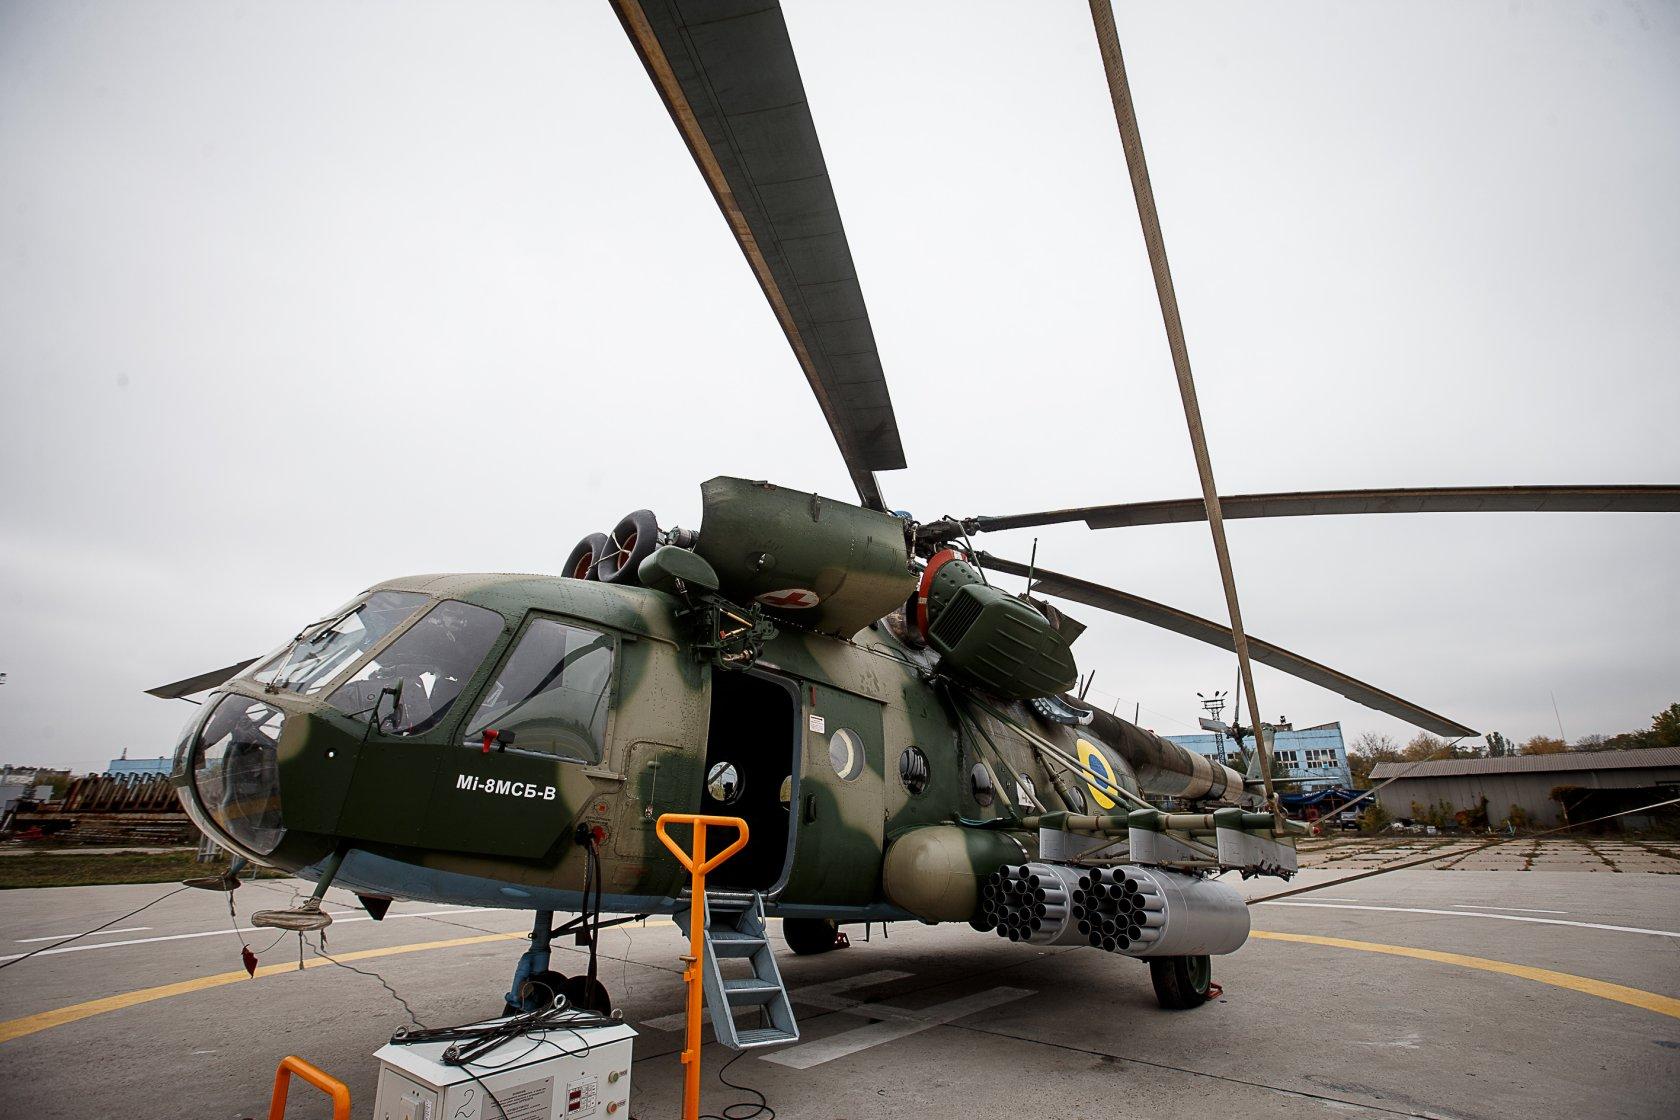 Ukraїnśkyj servisnyj centr iz remontu gelikopteriv vidkryly u Bangladeši